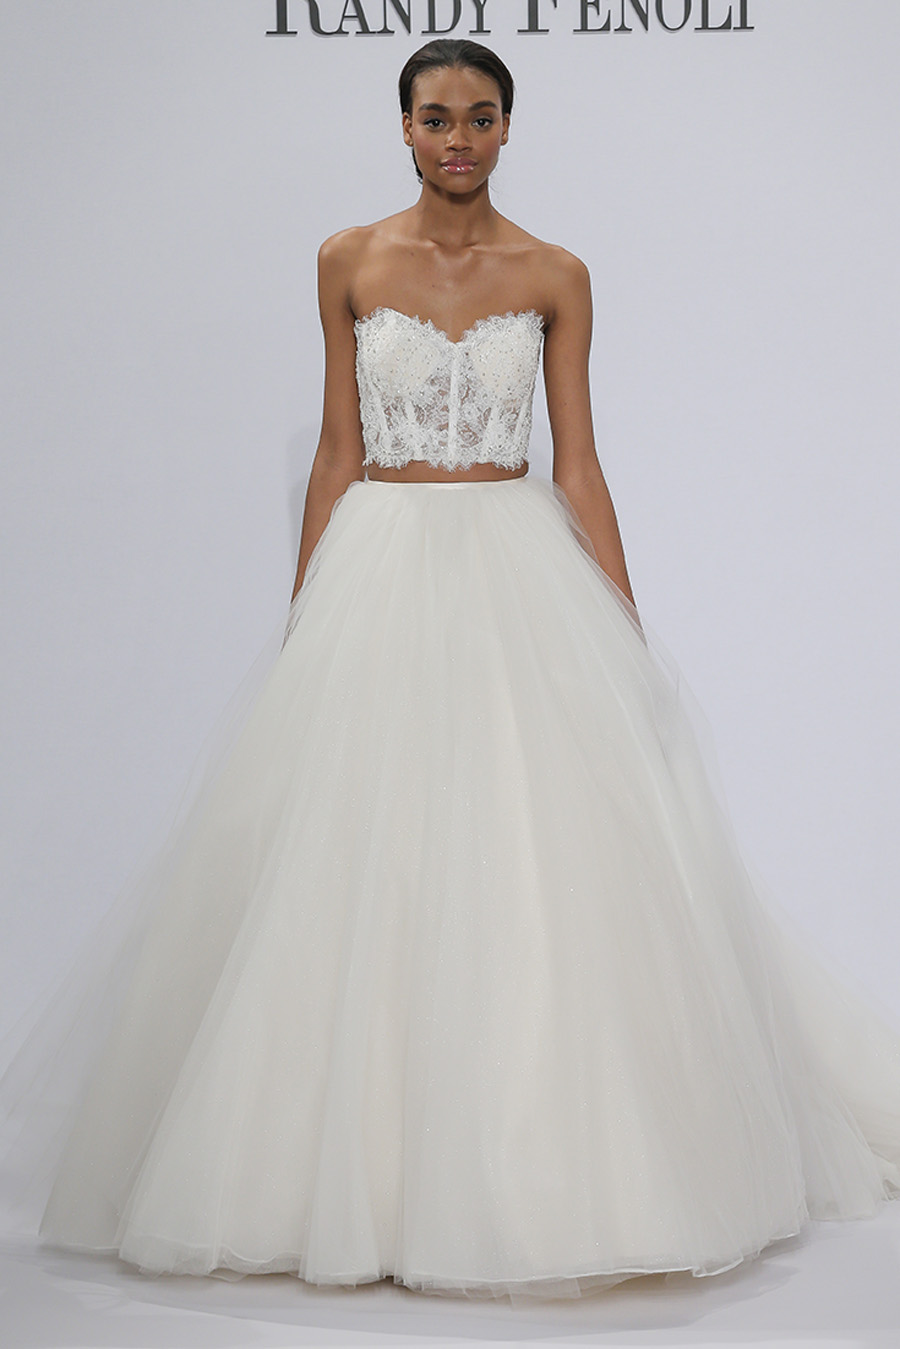 Randy Fenoli Bridal Collection gown 18